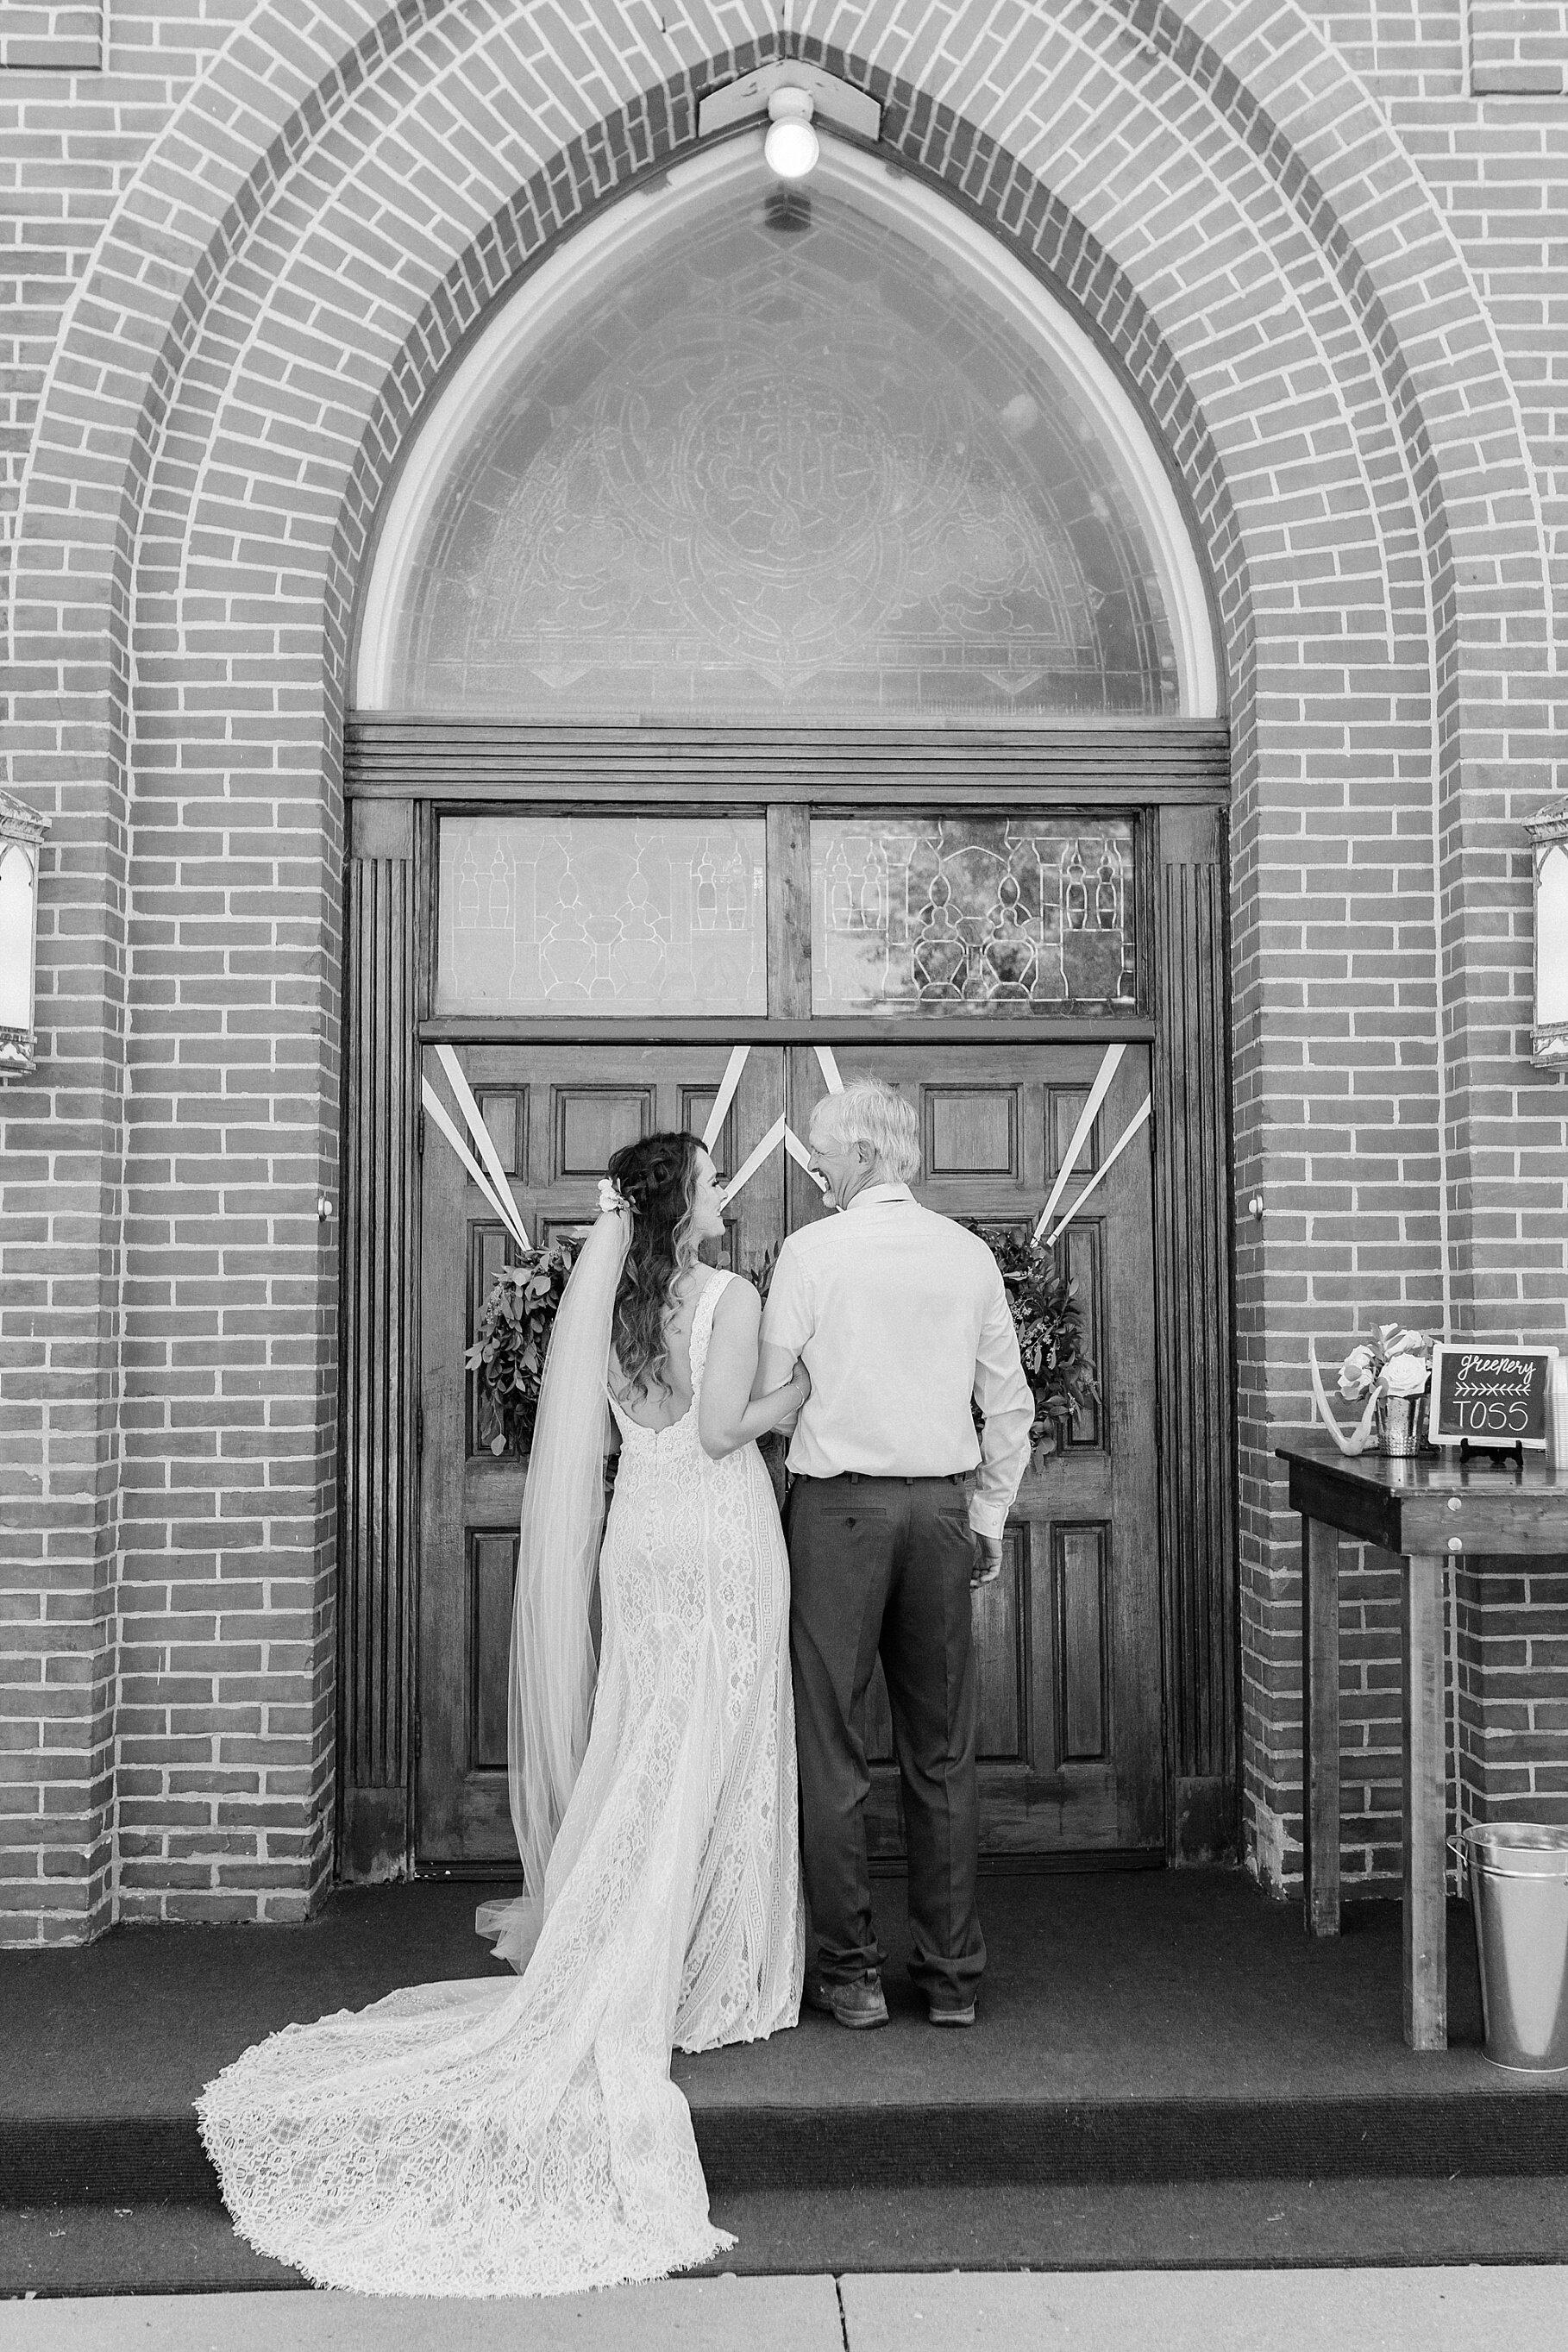 Earth-Toned Wedding by KKP Associate Wedding Photographer and Kelsi Kliethermes Photography Best Columbia Missouri Wedding Photographer_0045.jpg